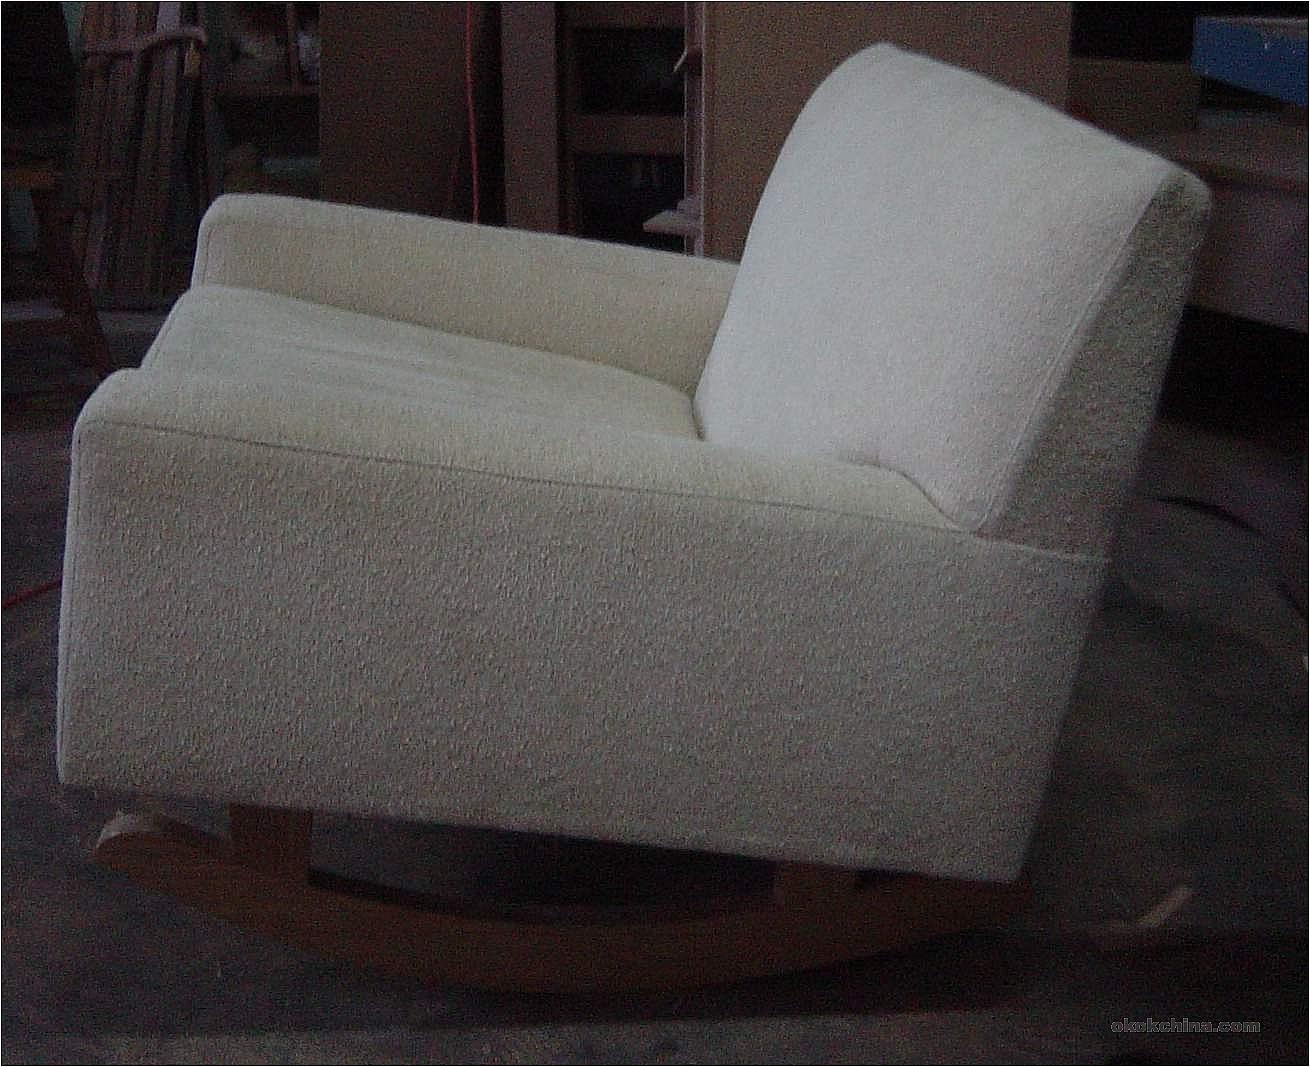 Rocking Sofa   Tehranmix Decoration With Rocking Sofa Chairs (Image 13 of 20)